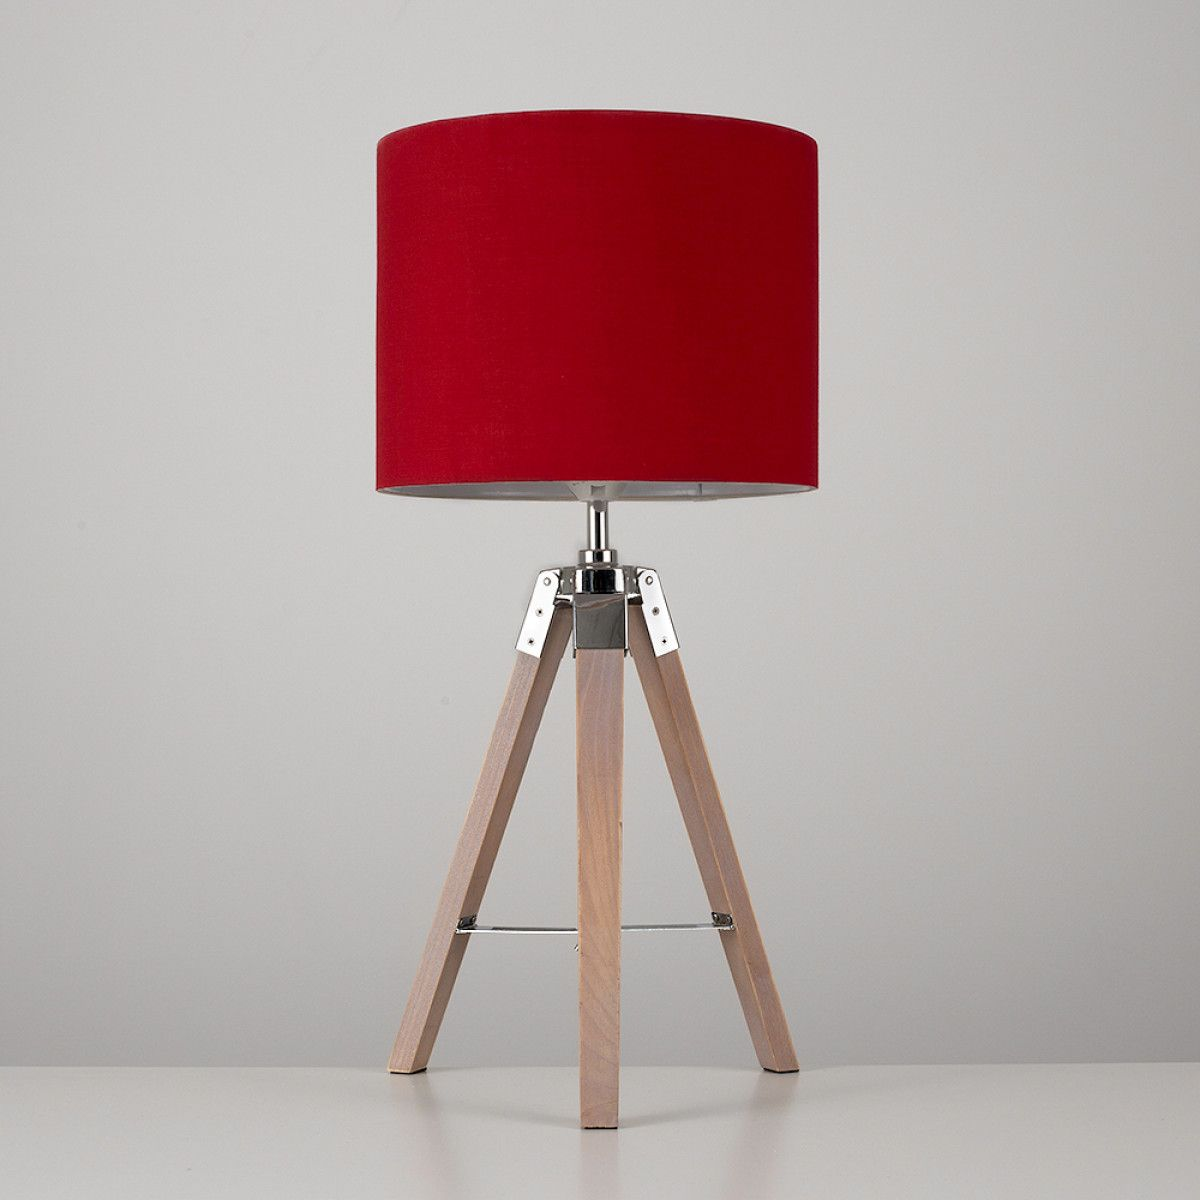 Marine Wooden Tripod Table Lamp, Red Shade   Lamp, Tripod